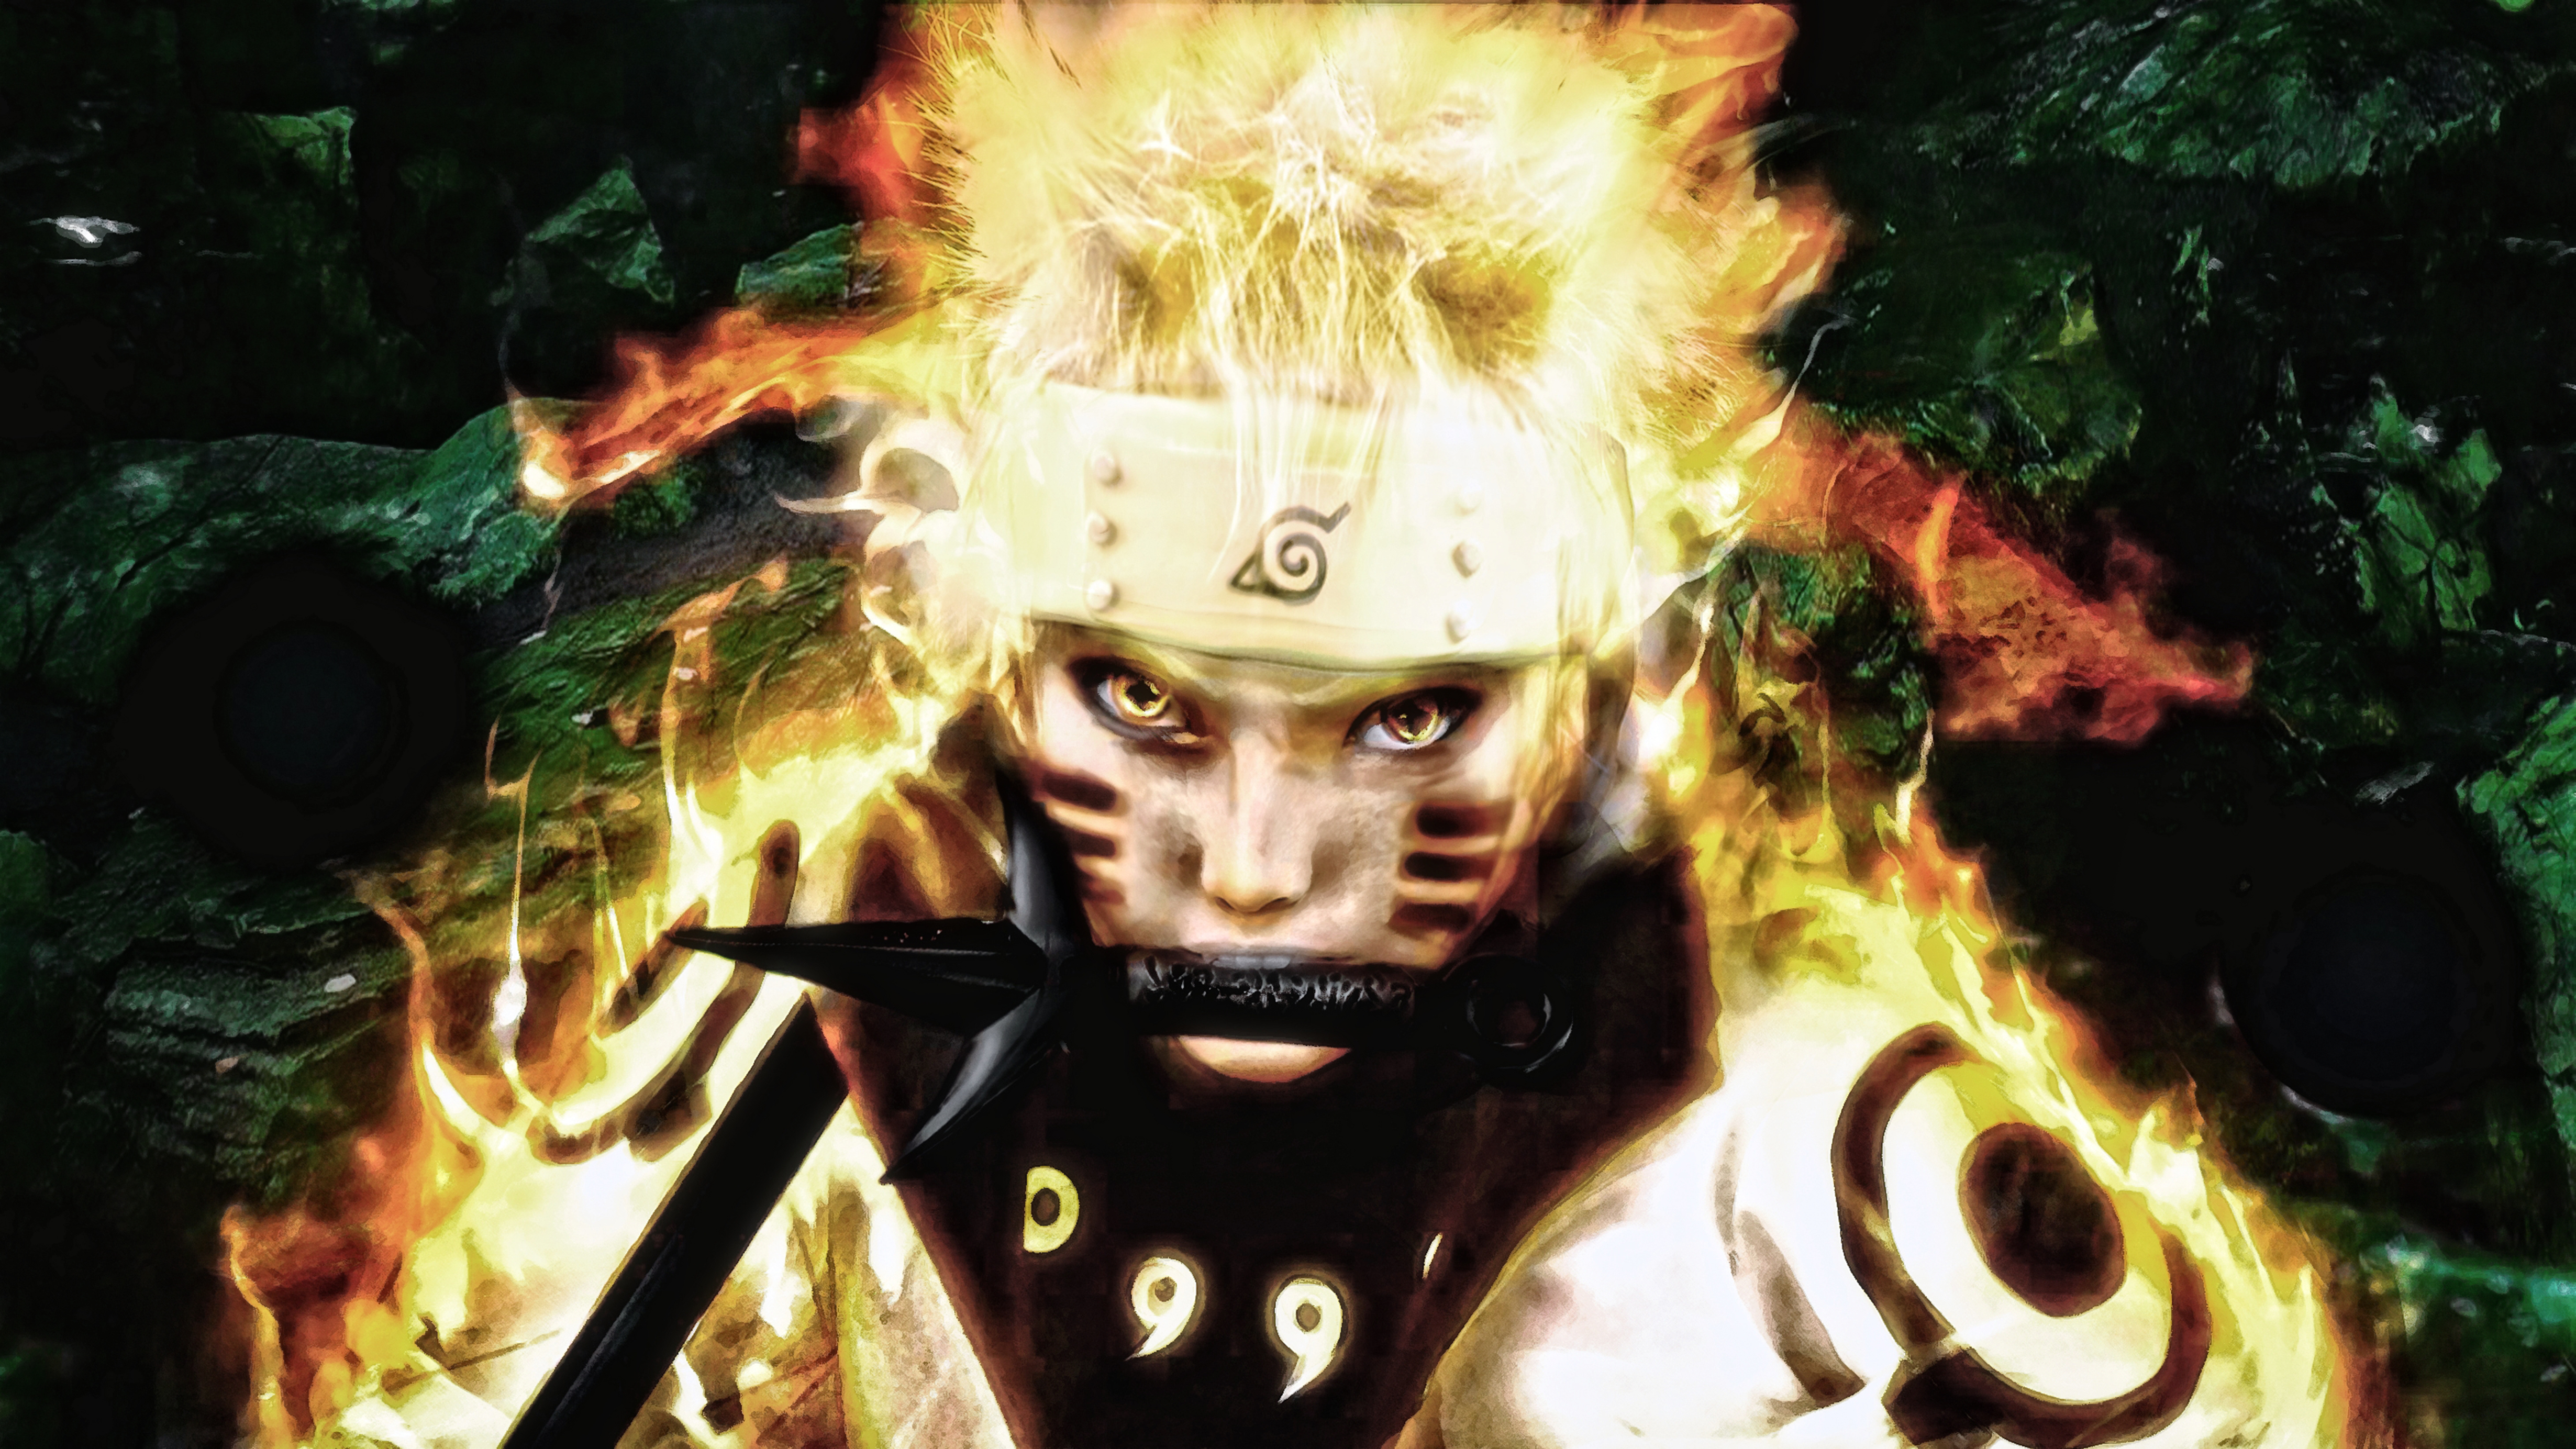 Naruto 4k Ultra Hd Wallpaper Background Image 4920x2768